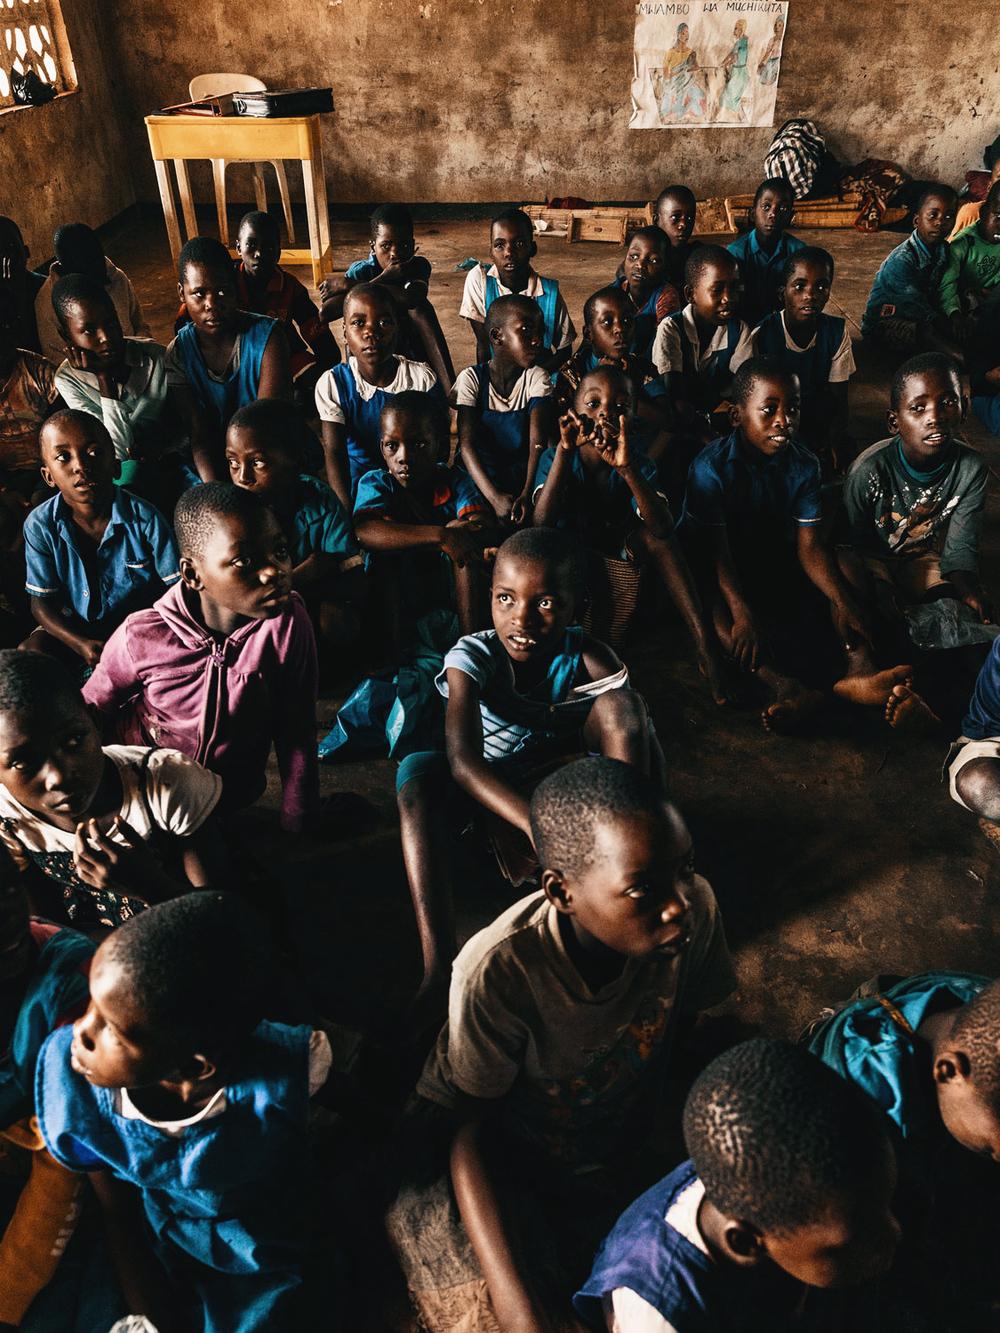 CallieGiovanna_Africa_Malawi_KandeBeach_20150101_05922.jpg